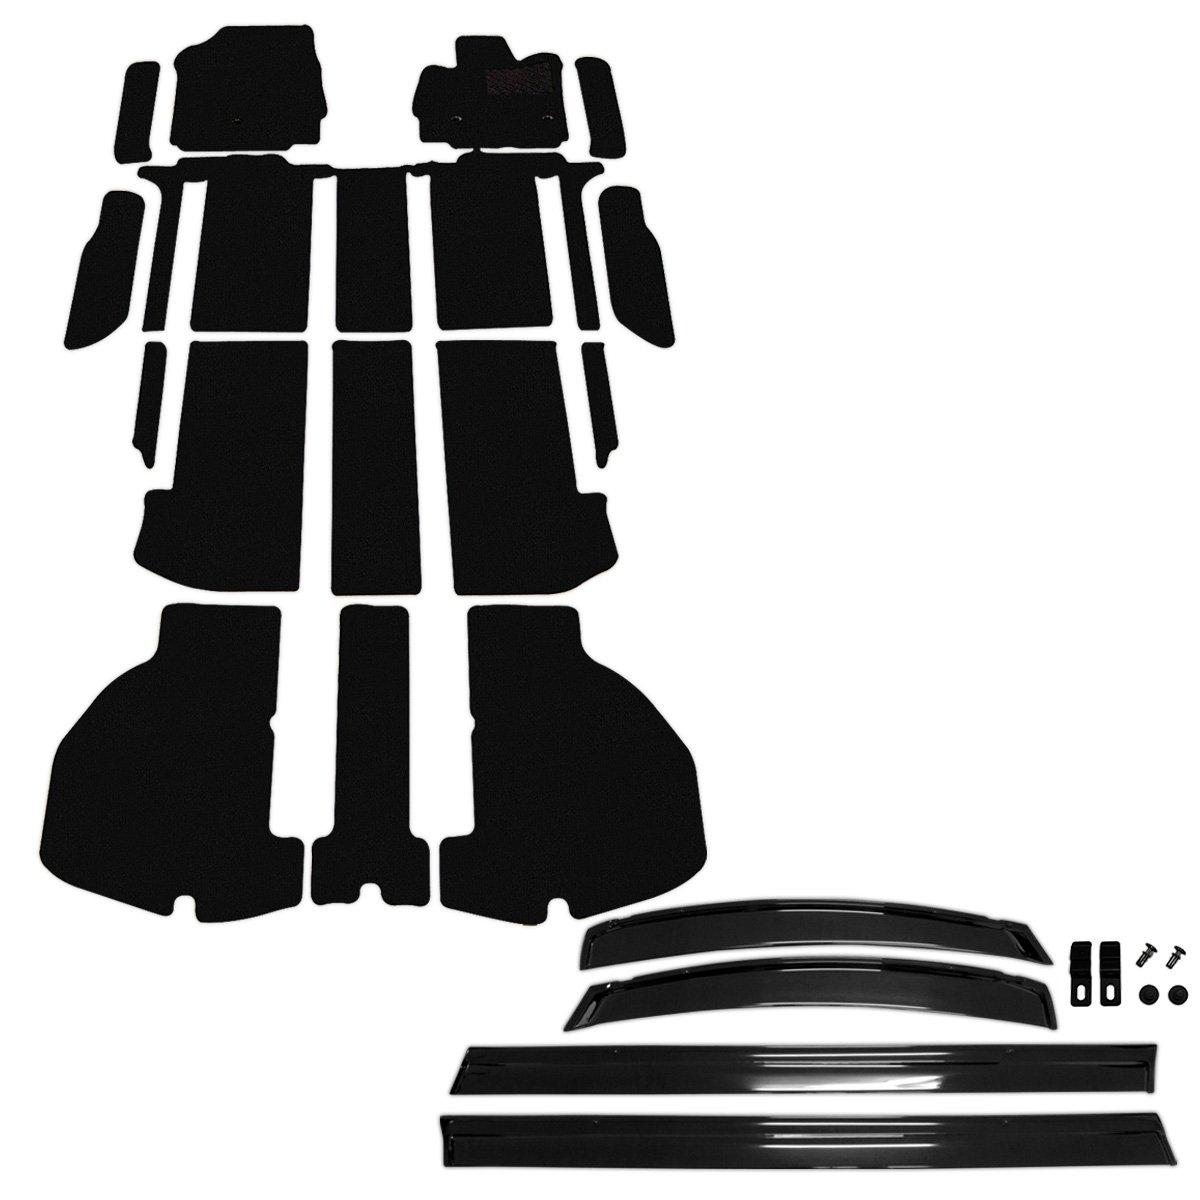 D.Iプランニング カー用品 フロアマット & ステップマット & サイドバイザー セット 型番5 【 トヨタ アルファード 30系 】 車用 カーマット DX黒 B00YM1MFTW 型番5|DX黒 DX黒 型番5